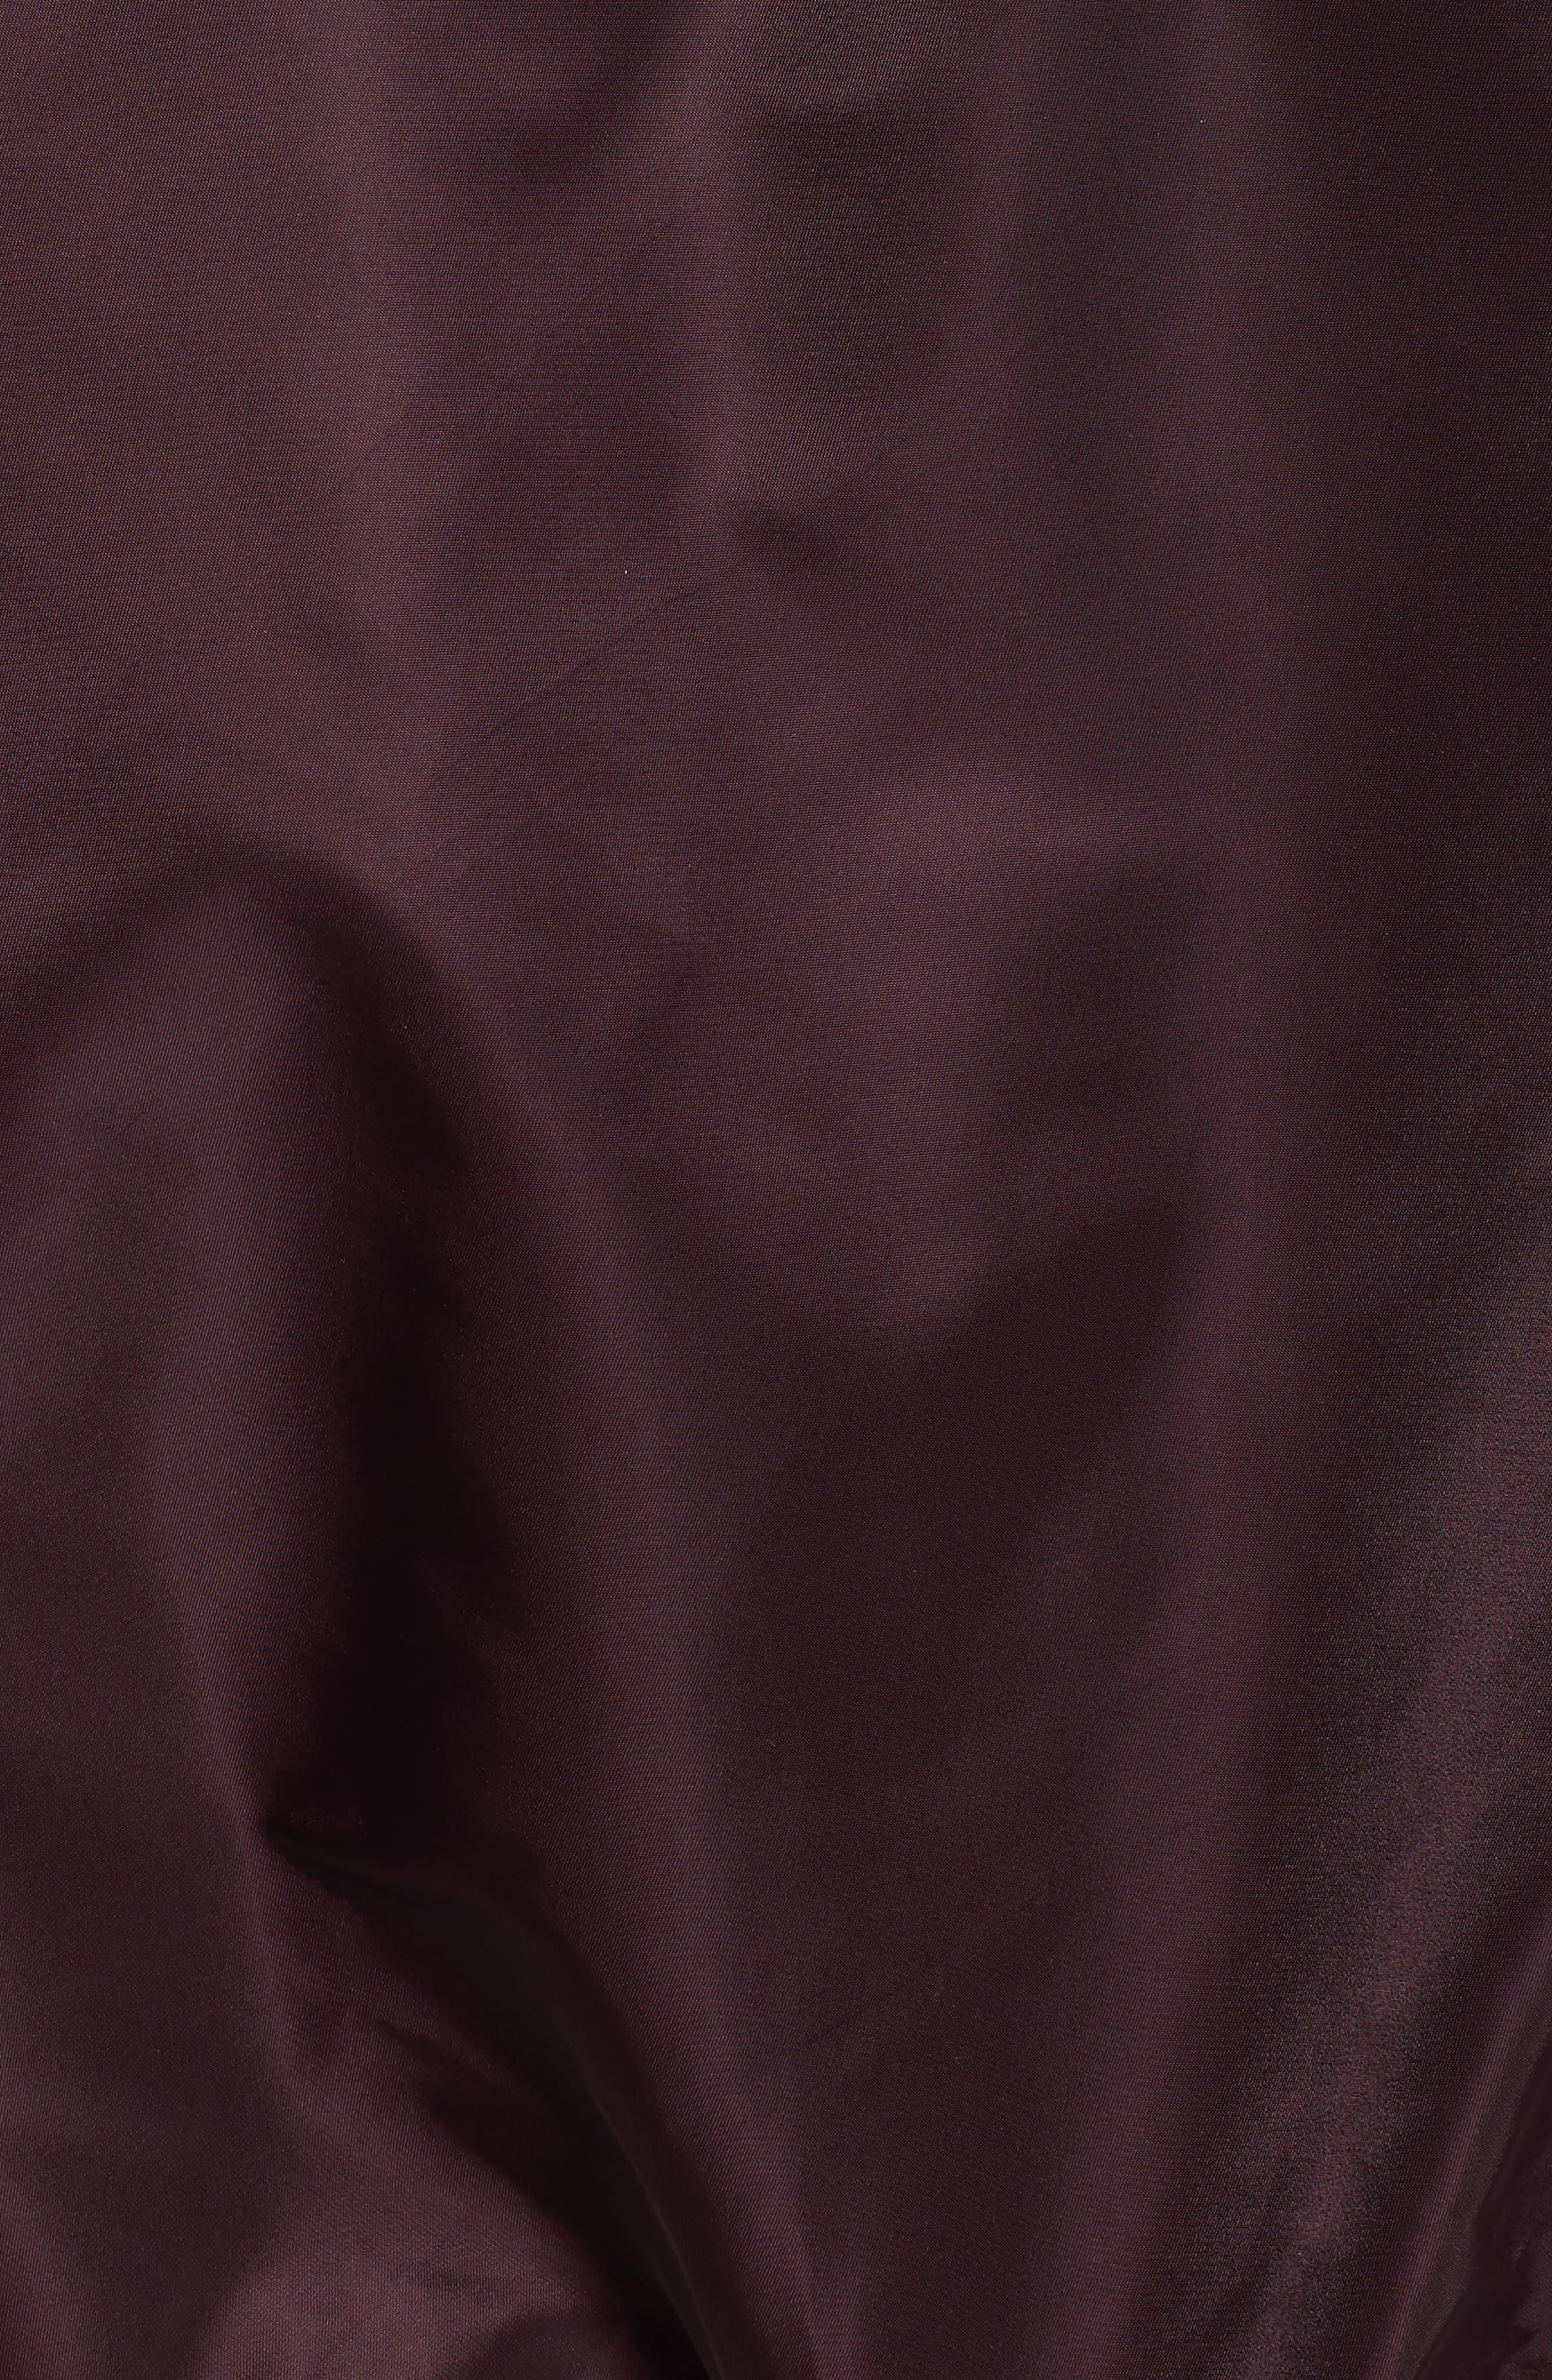 Nuxy Bomber Jacket,                             Alternate thumbnail 6, color,                             202